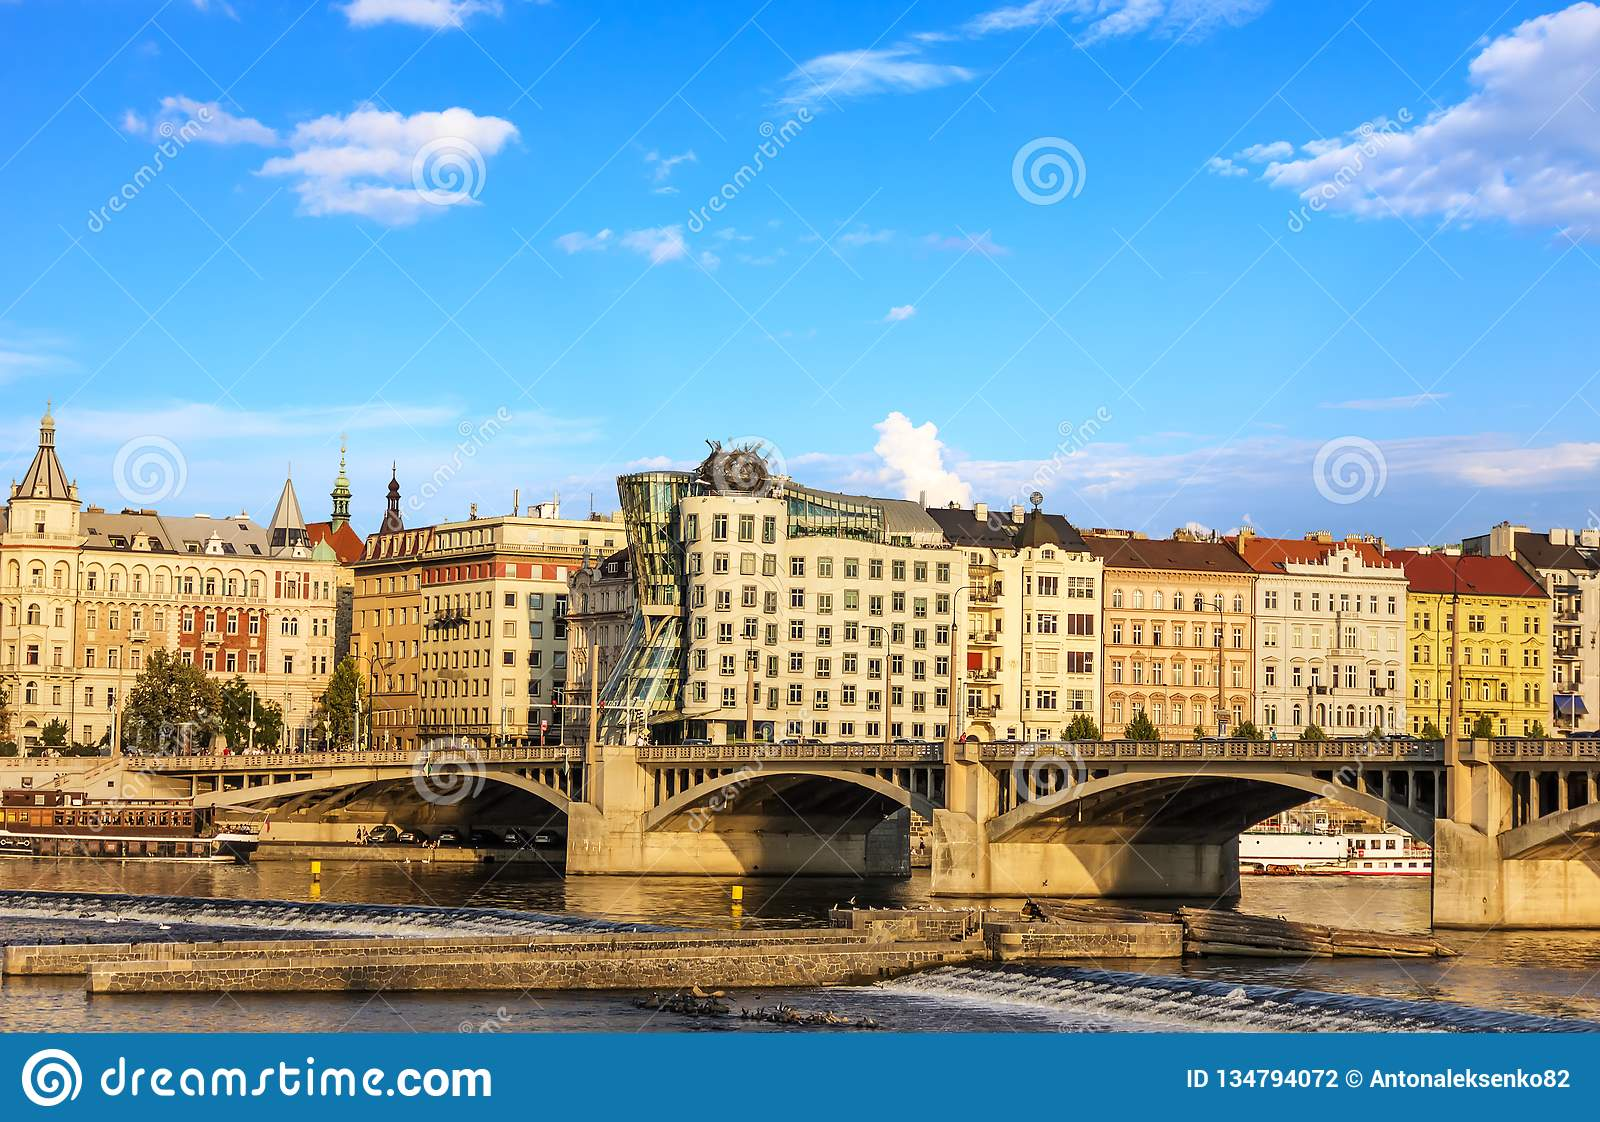 Dancing House in Prague and Jirasek Bridge bridge over the Vltava